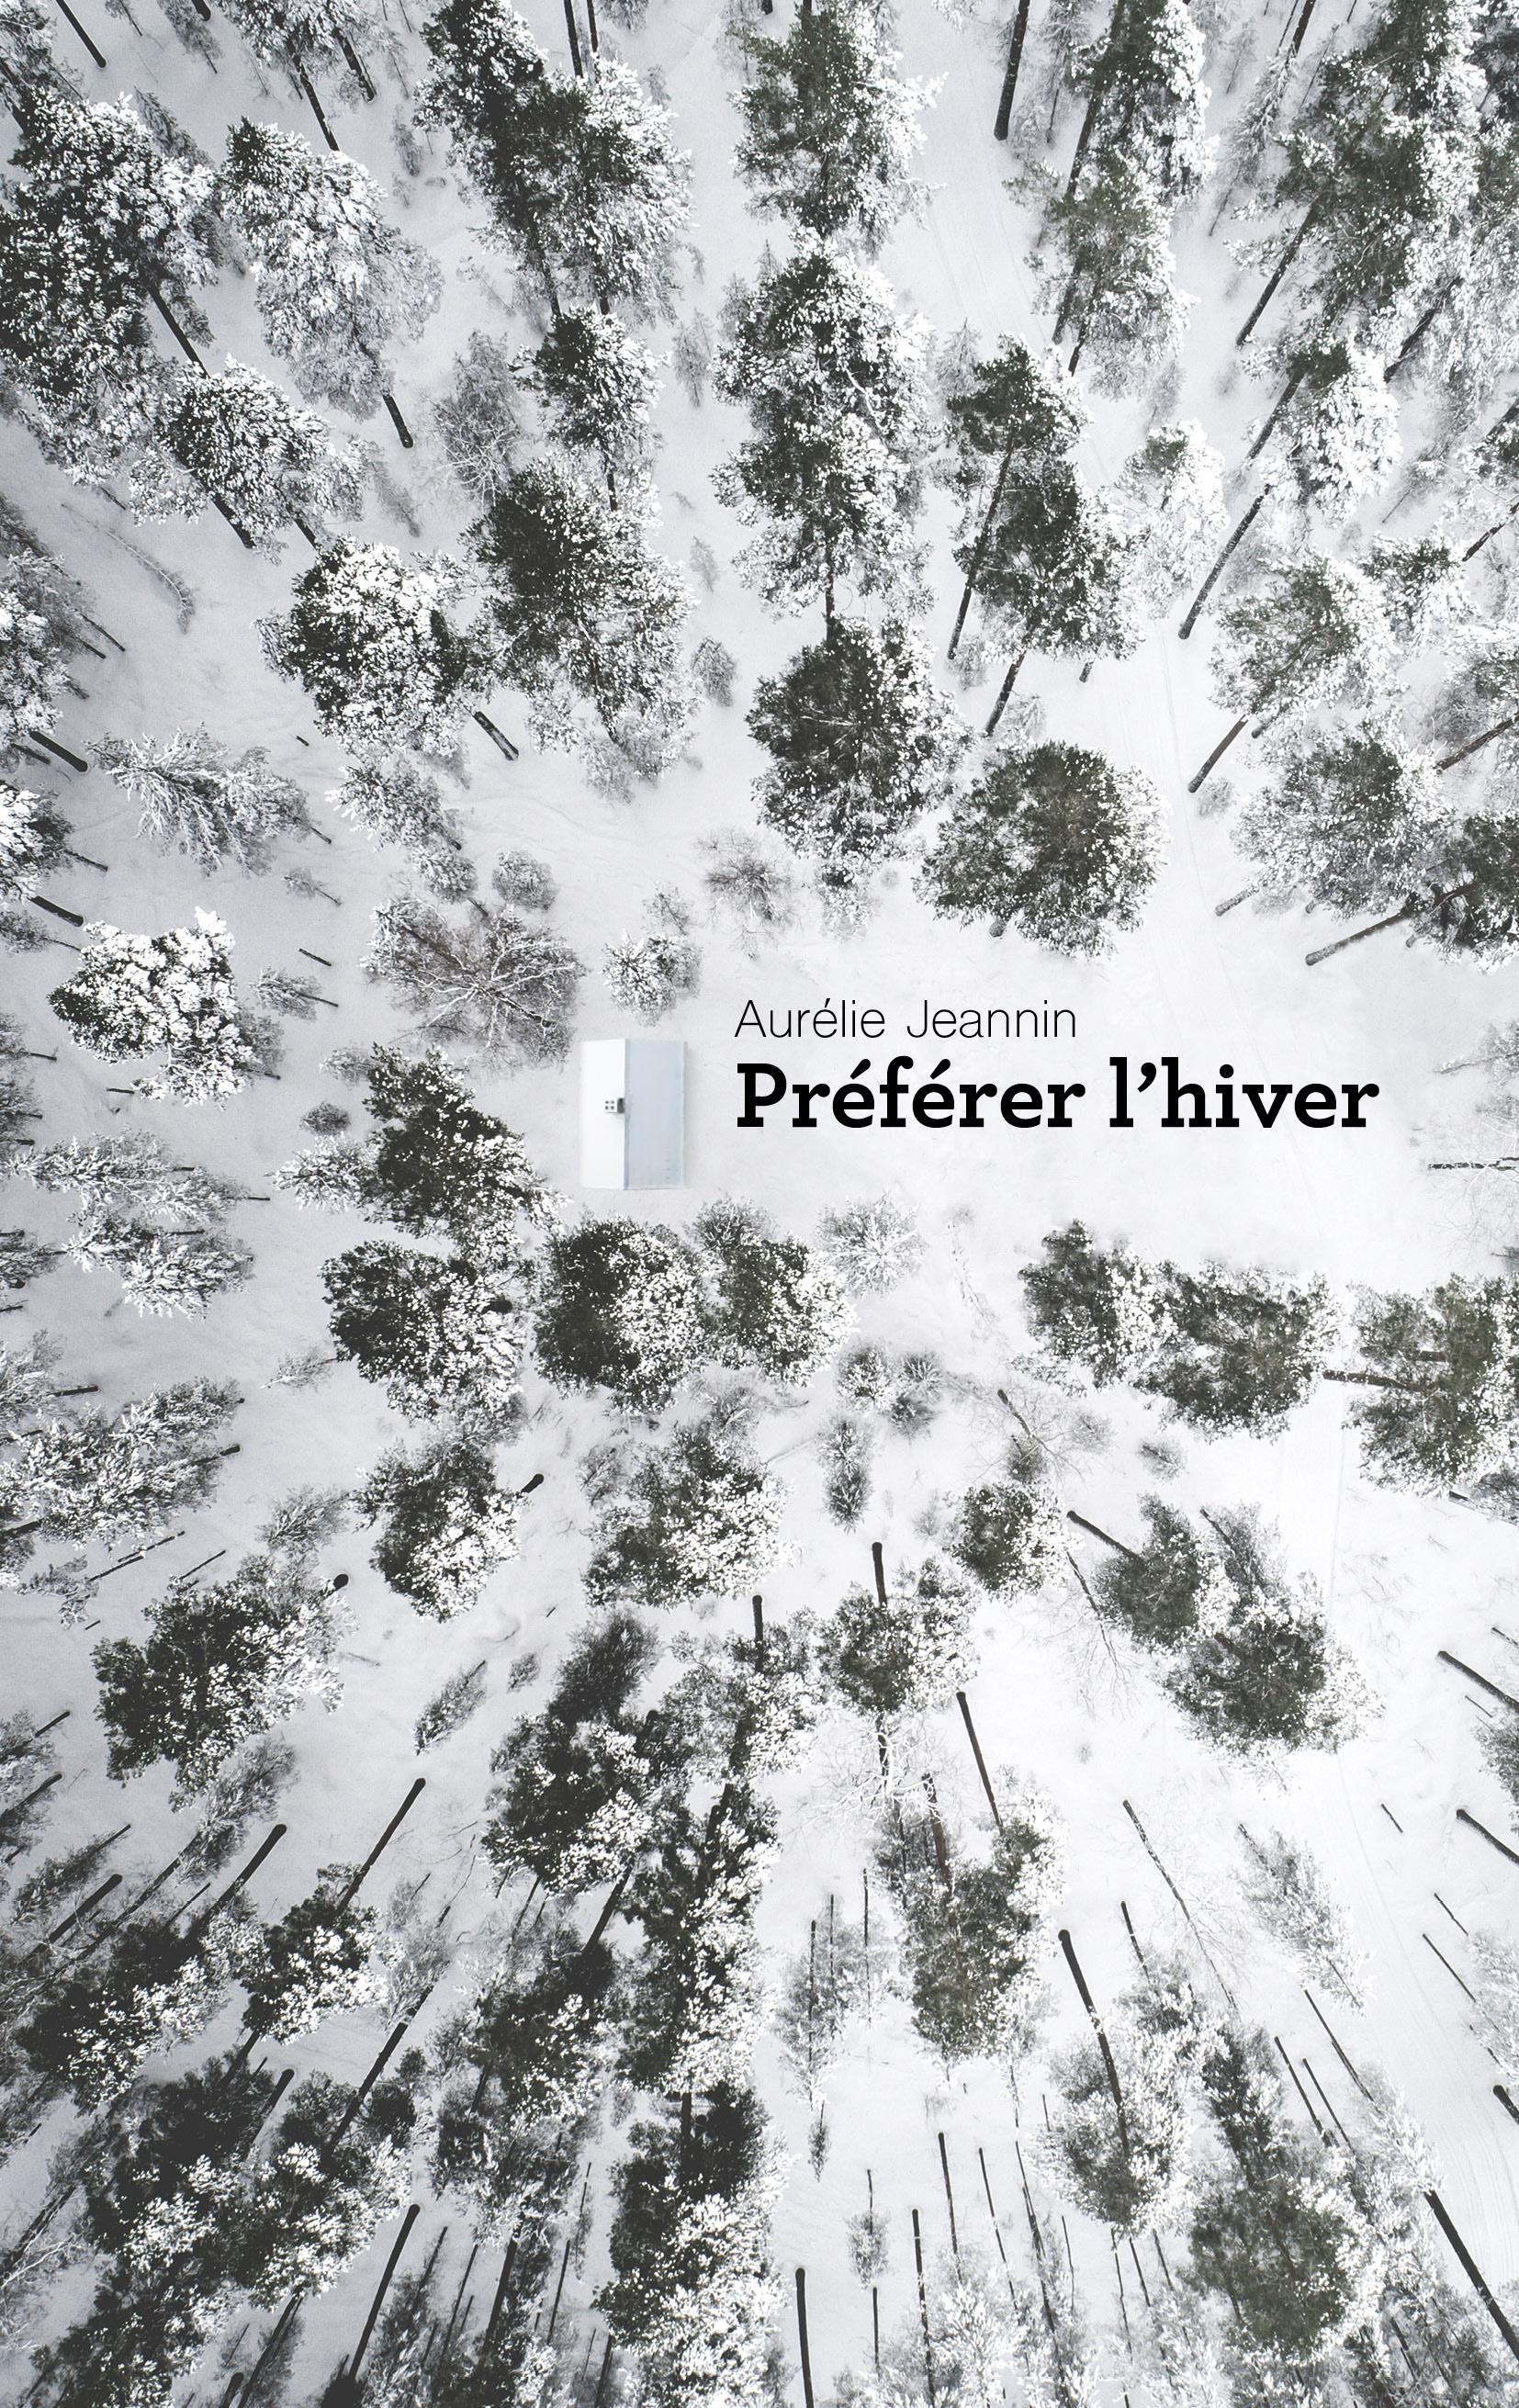 PREFERER L'HIVER